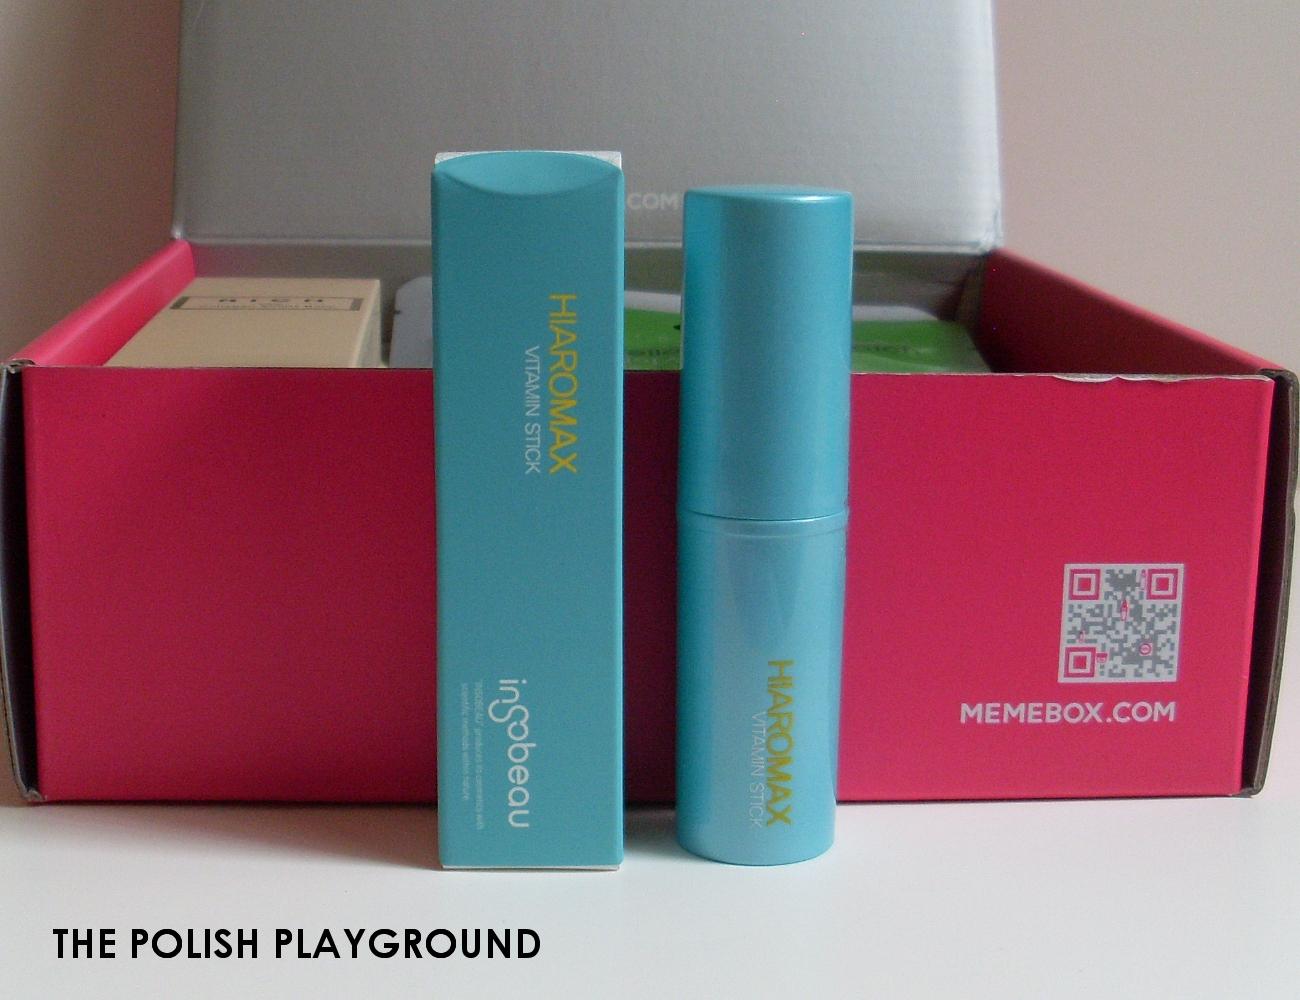 Memebox Special #35 Moisture Surge Unboxing - insobeau Hiaromax Vitamin Stick